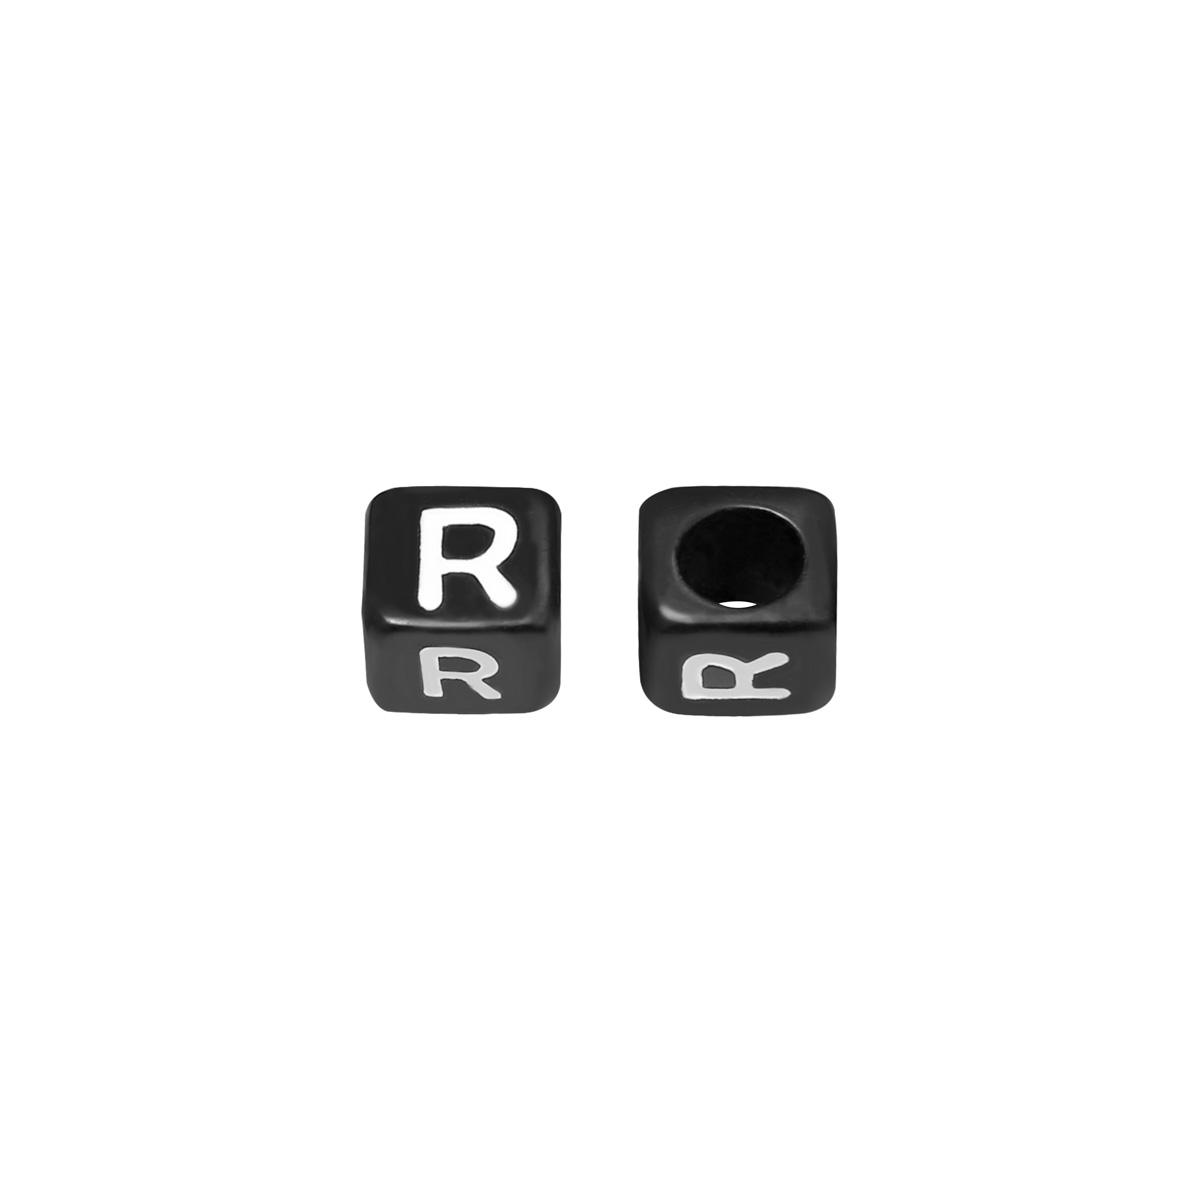 Perlen diy letter r - 6mm